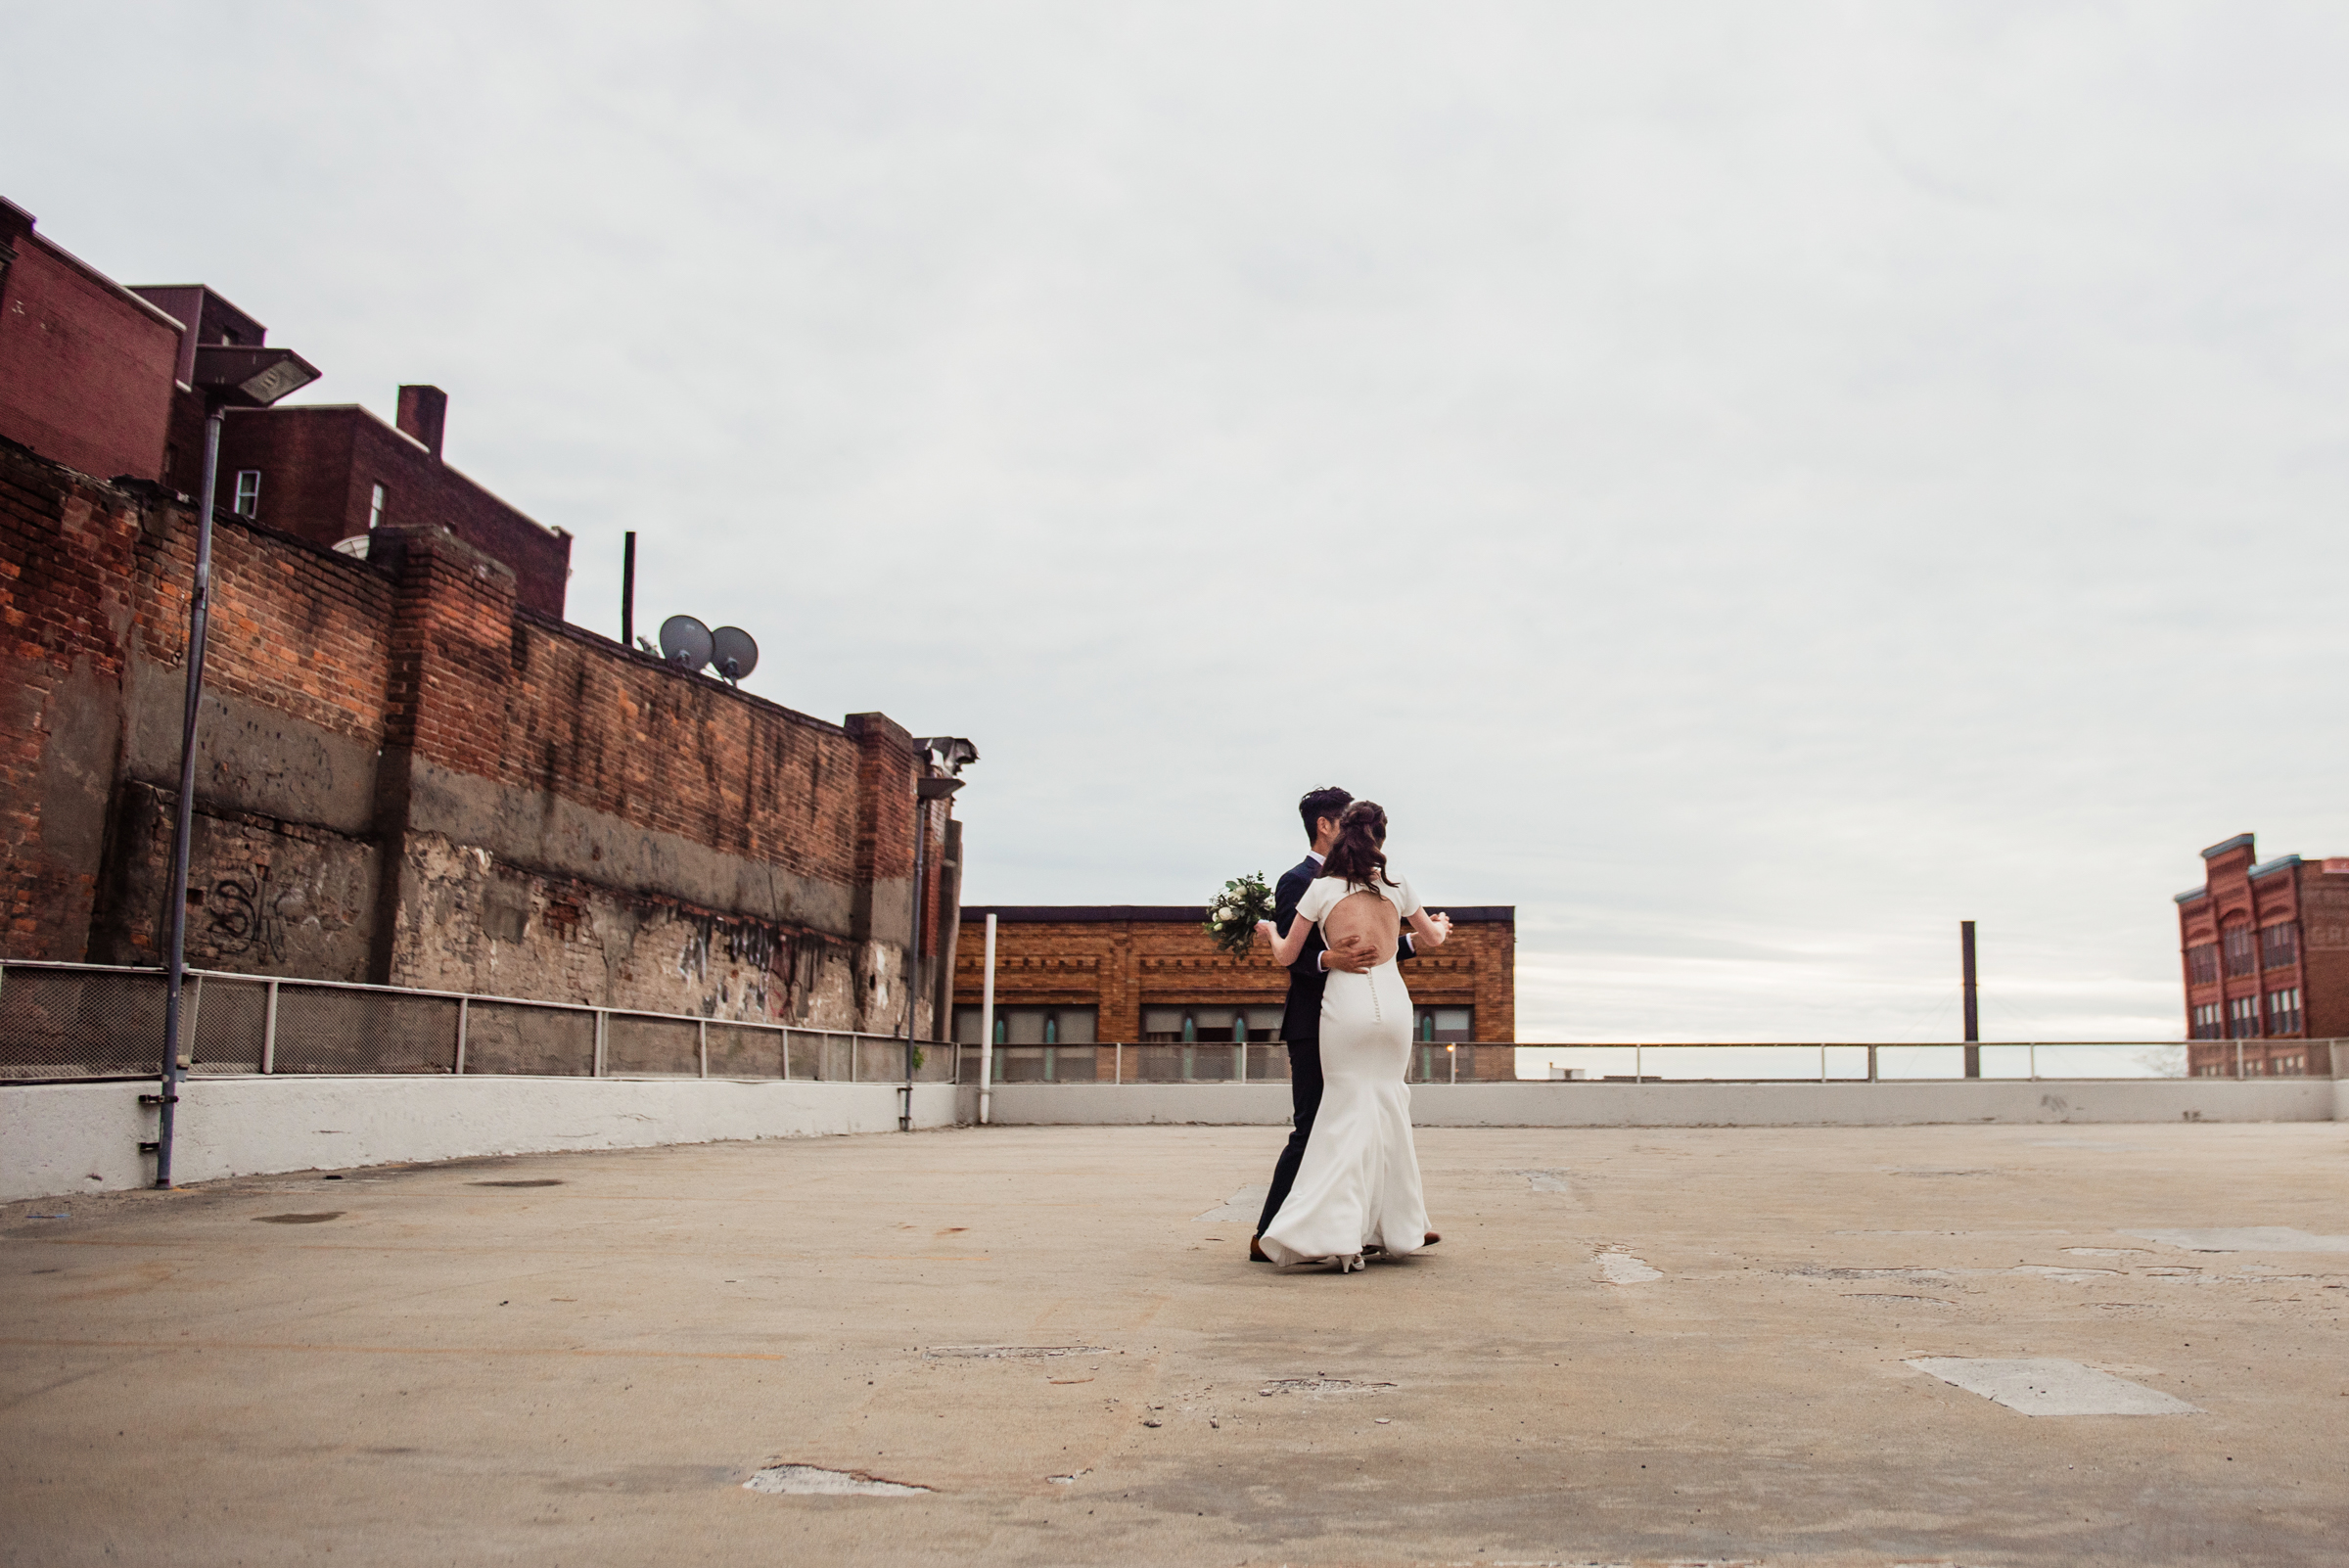 SKY_Armory_Syracuse_Wedding_JILL_STUDIO_Rochester_NY_Photographer_DSC_6288.jpg